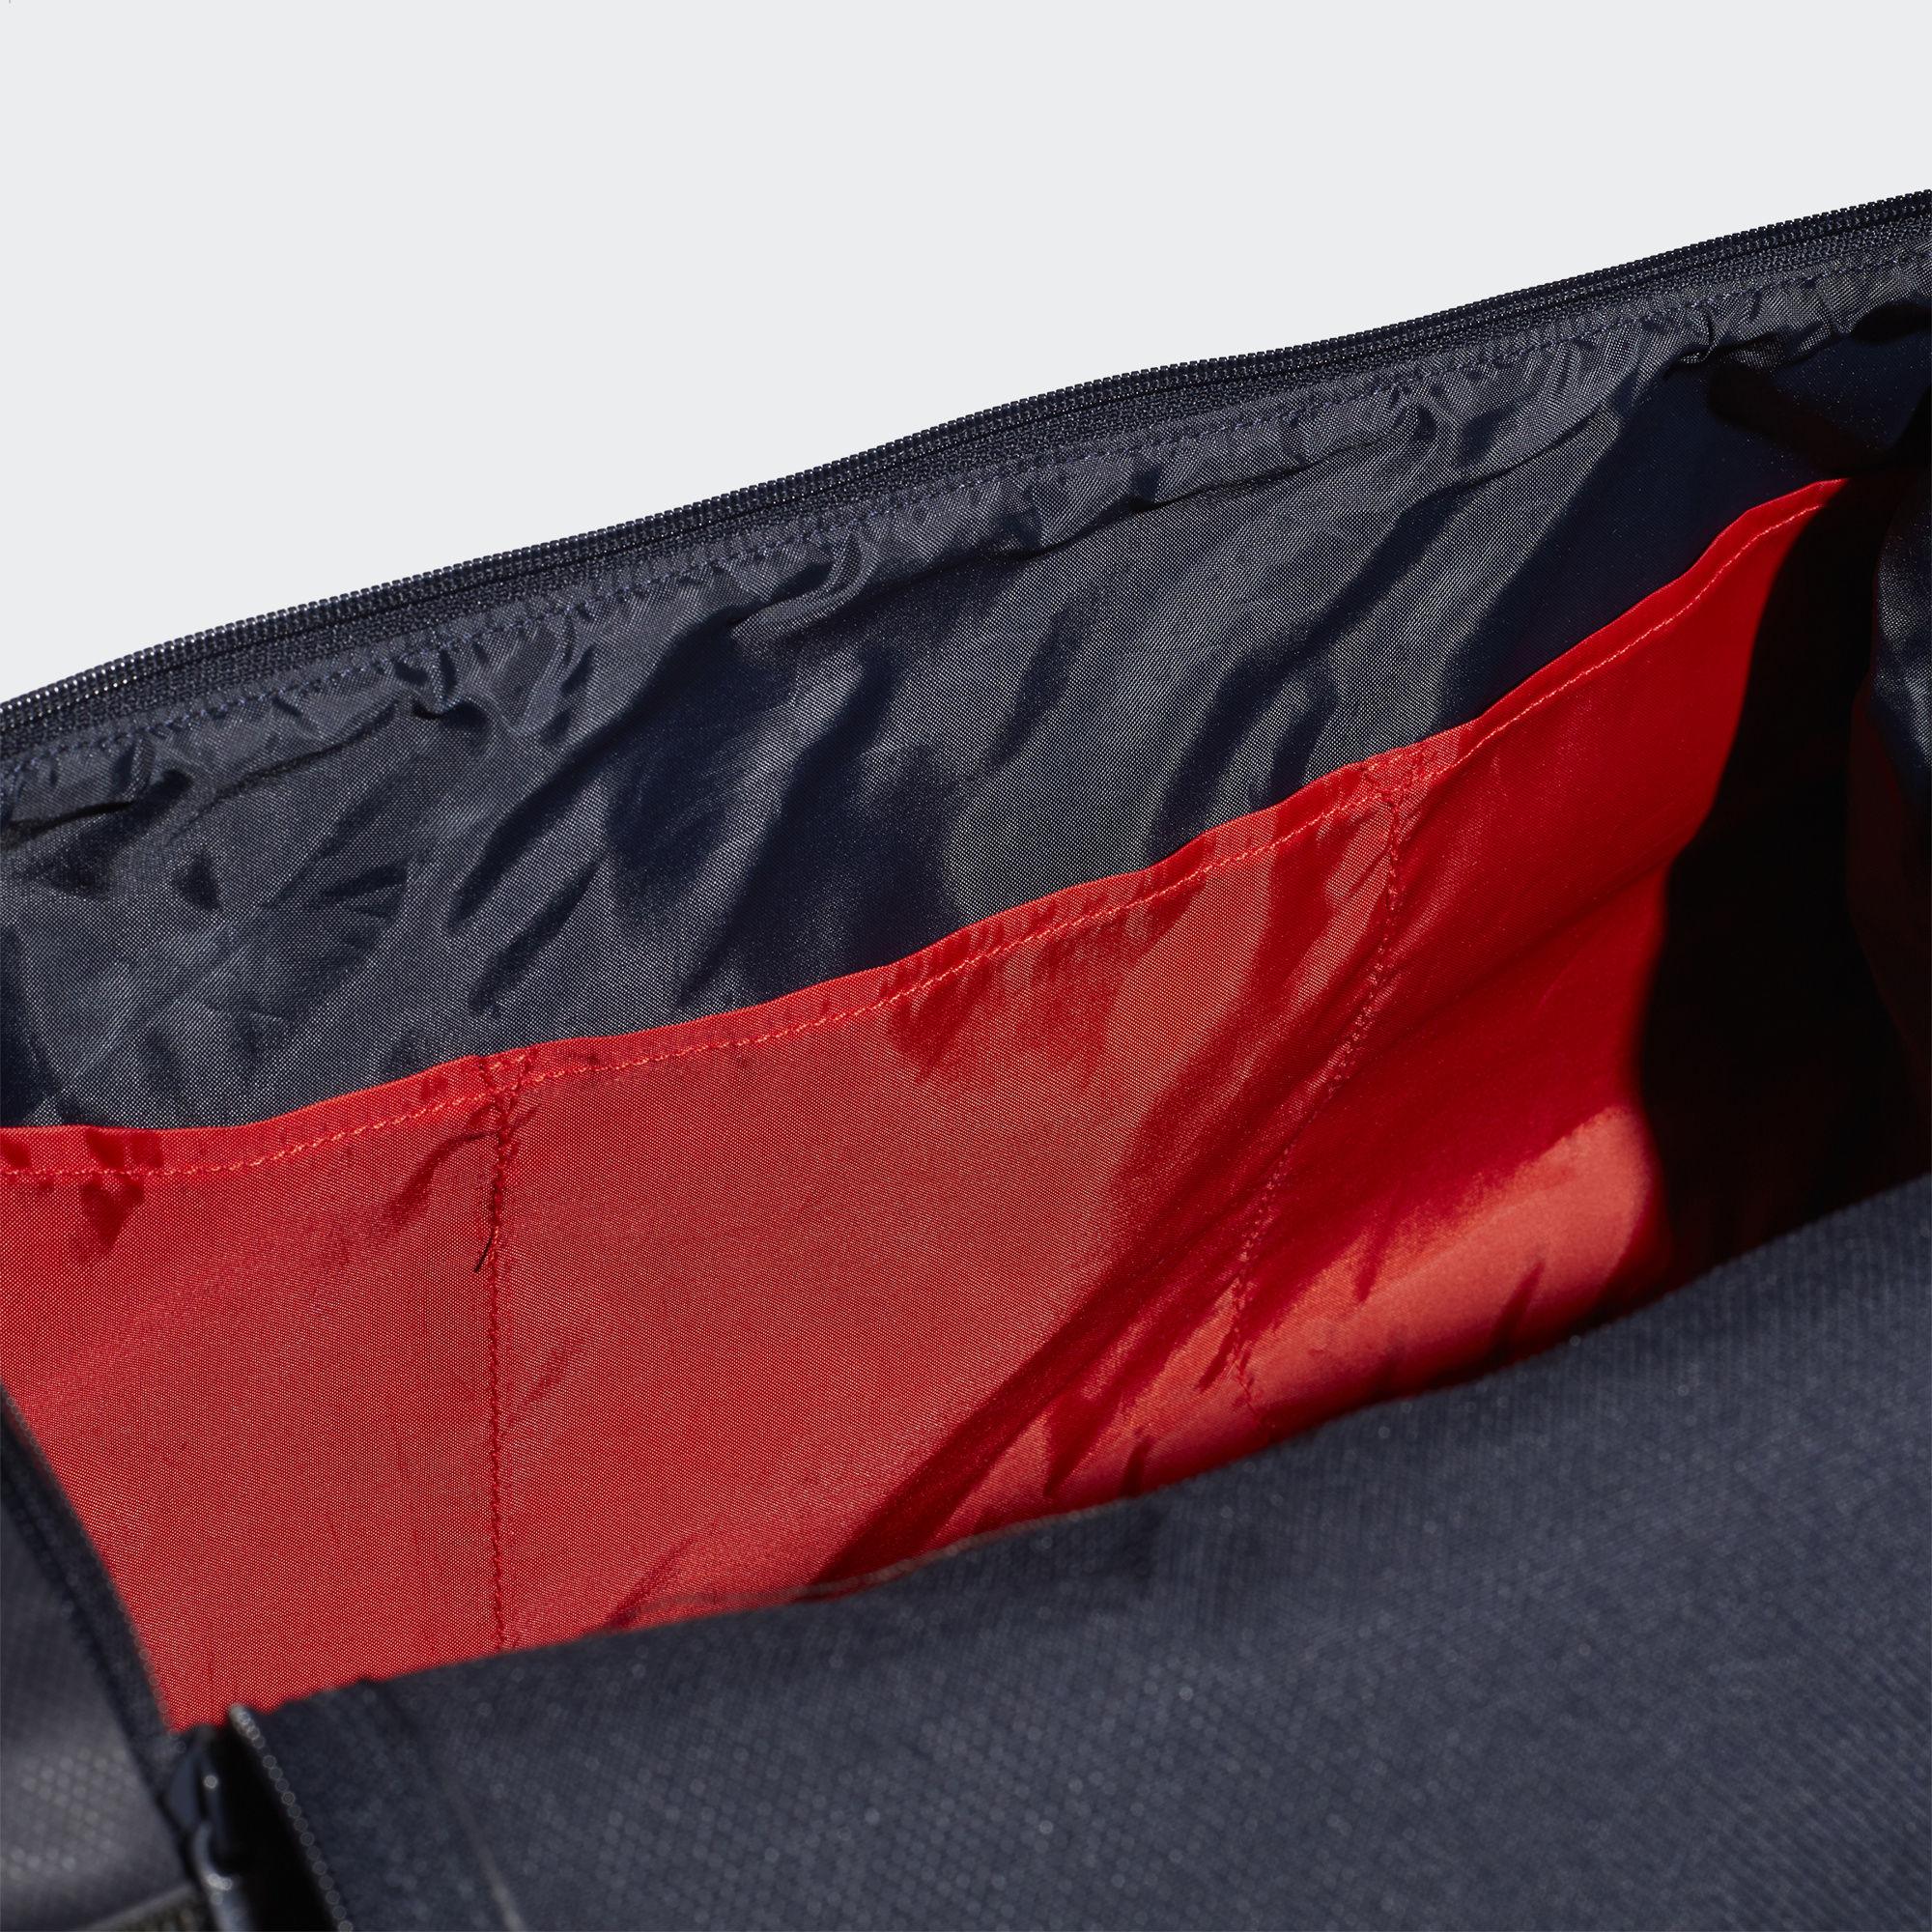 15c01b036e40 Спортивная сумка Convertible Training DW4923 adidas Performance ...